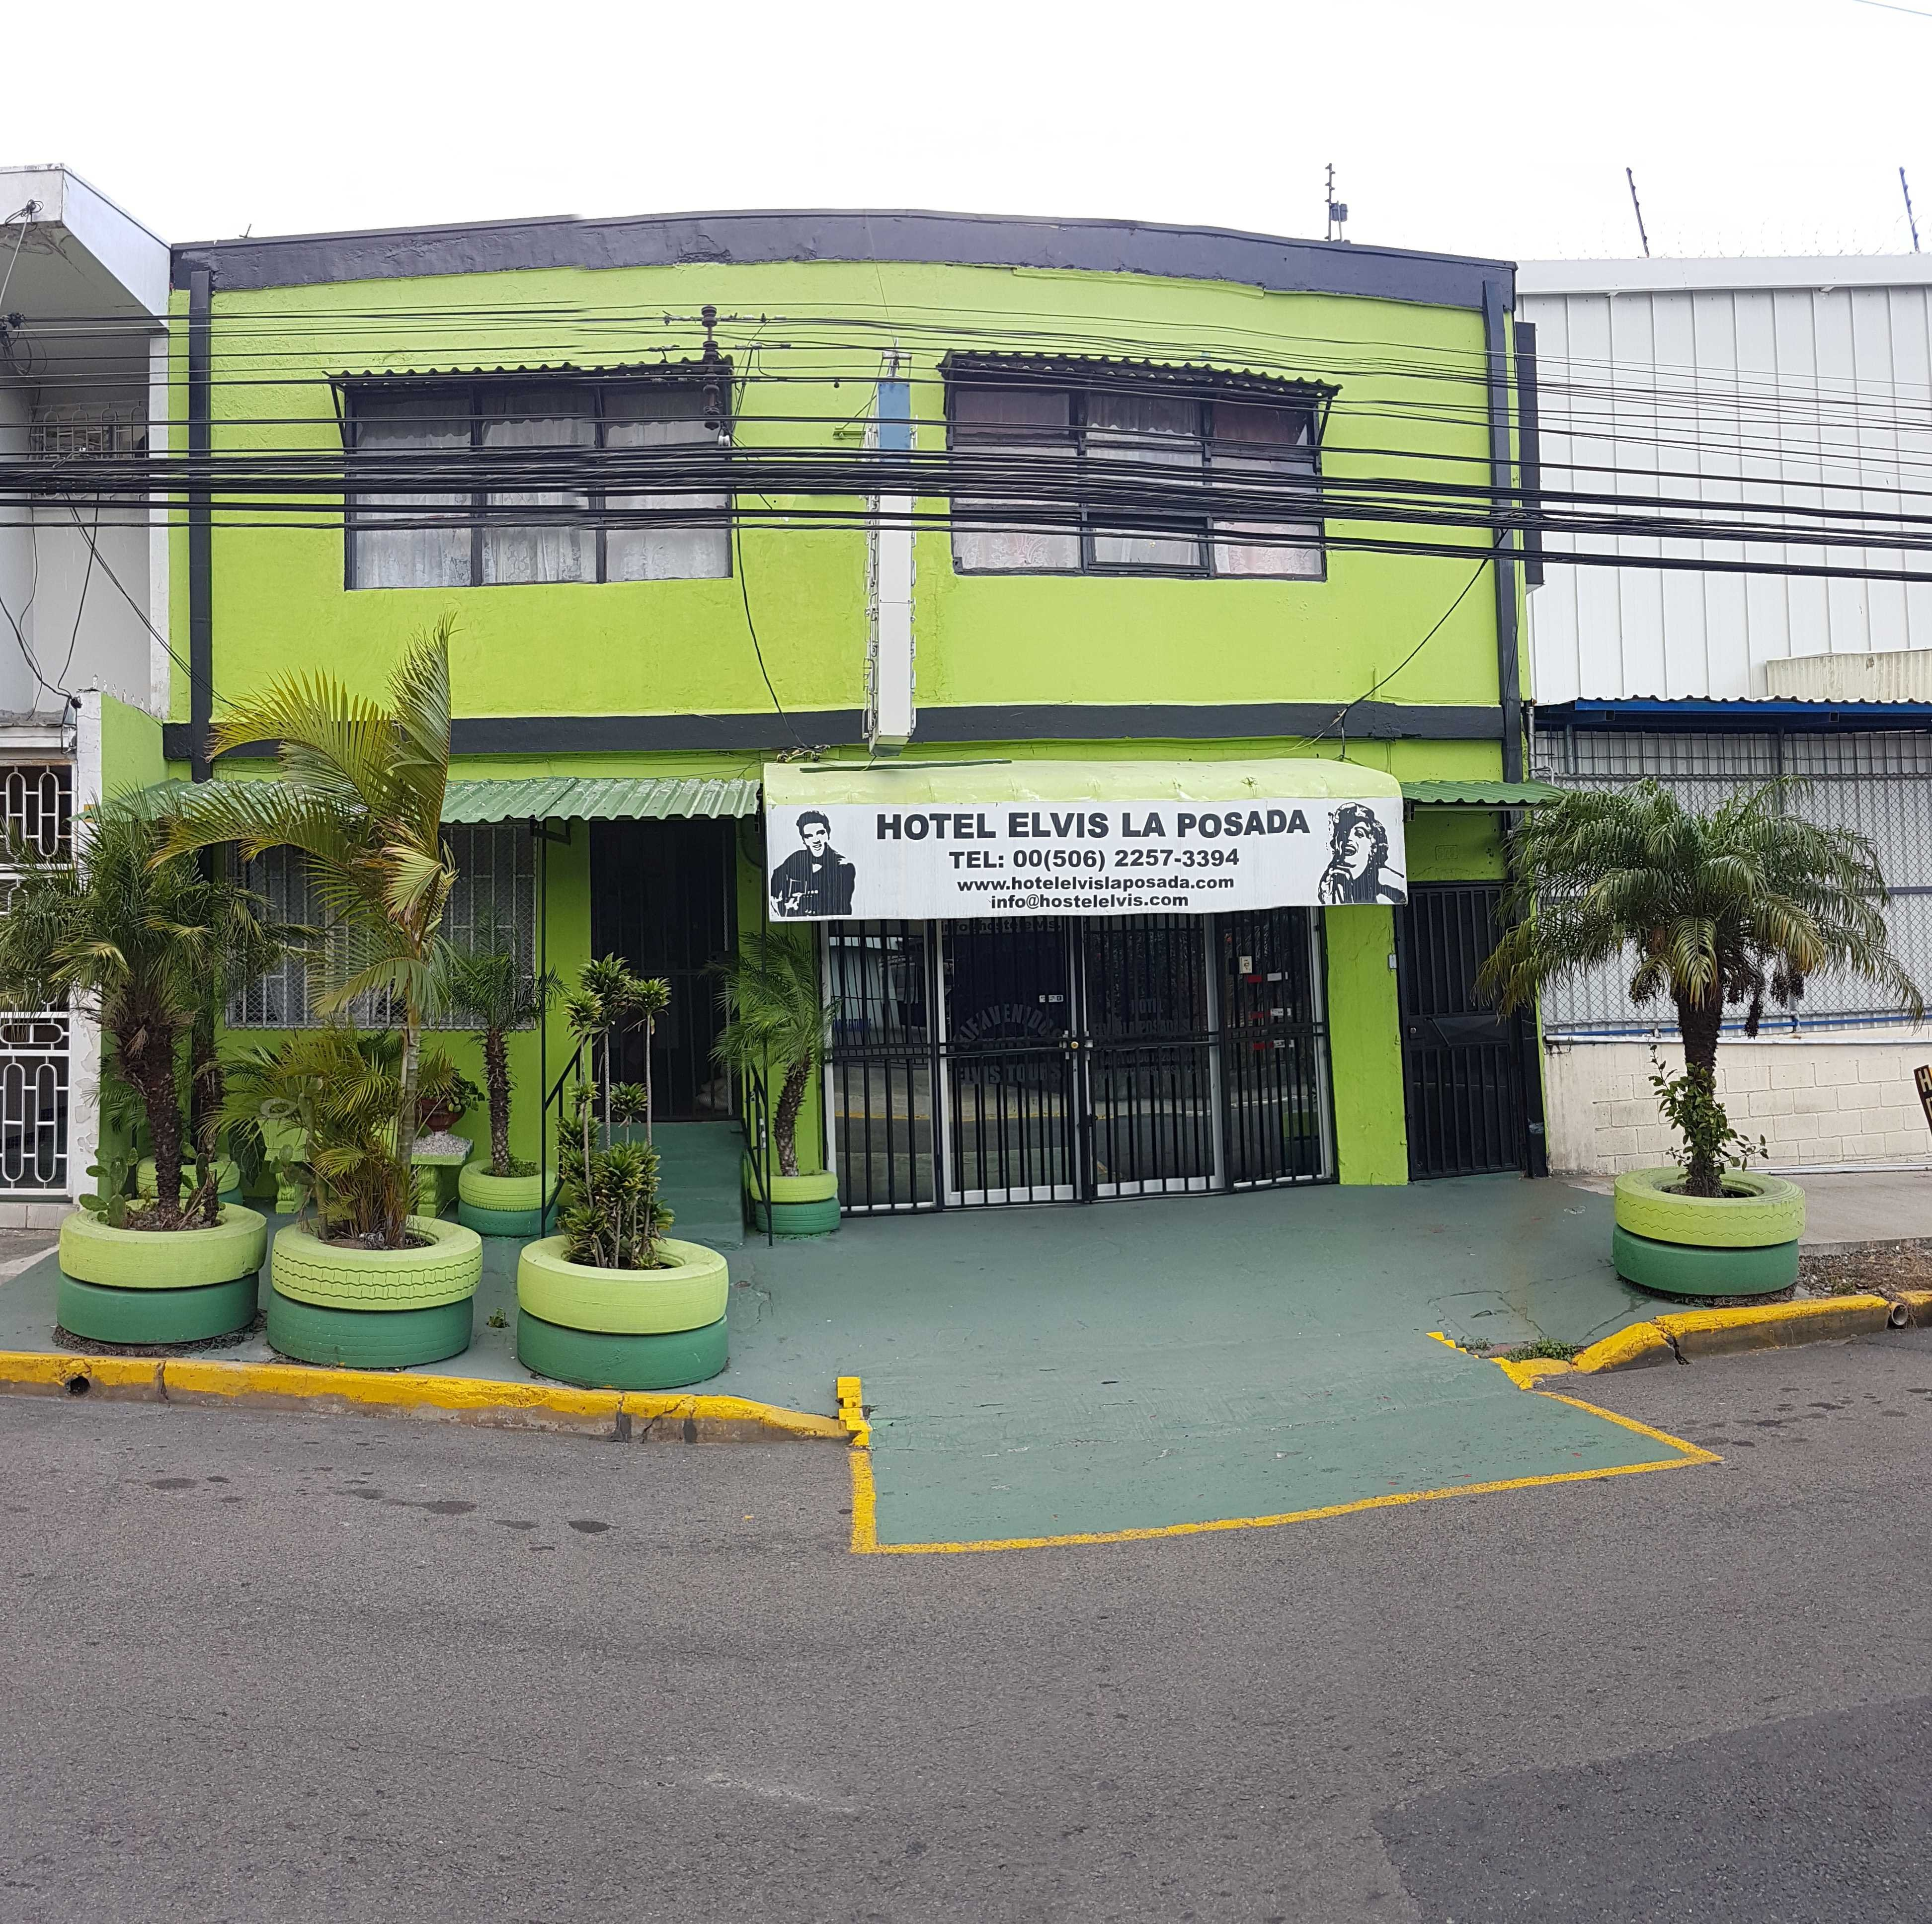 Hotel Elvis La Posada